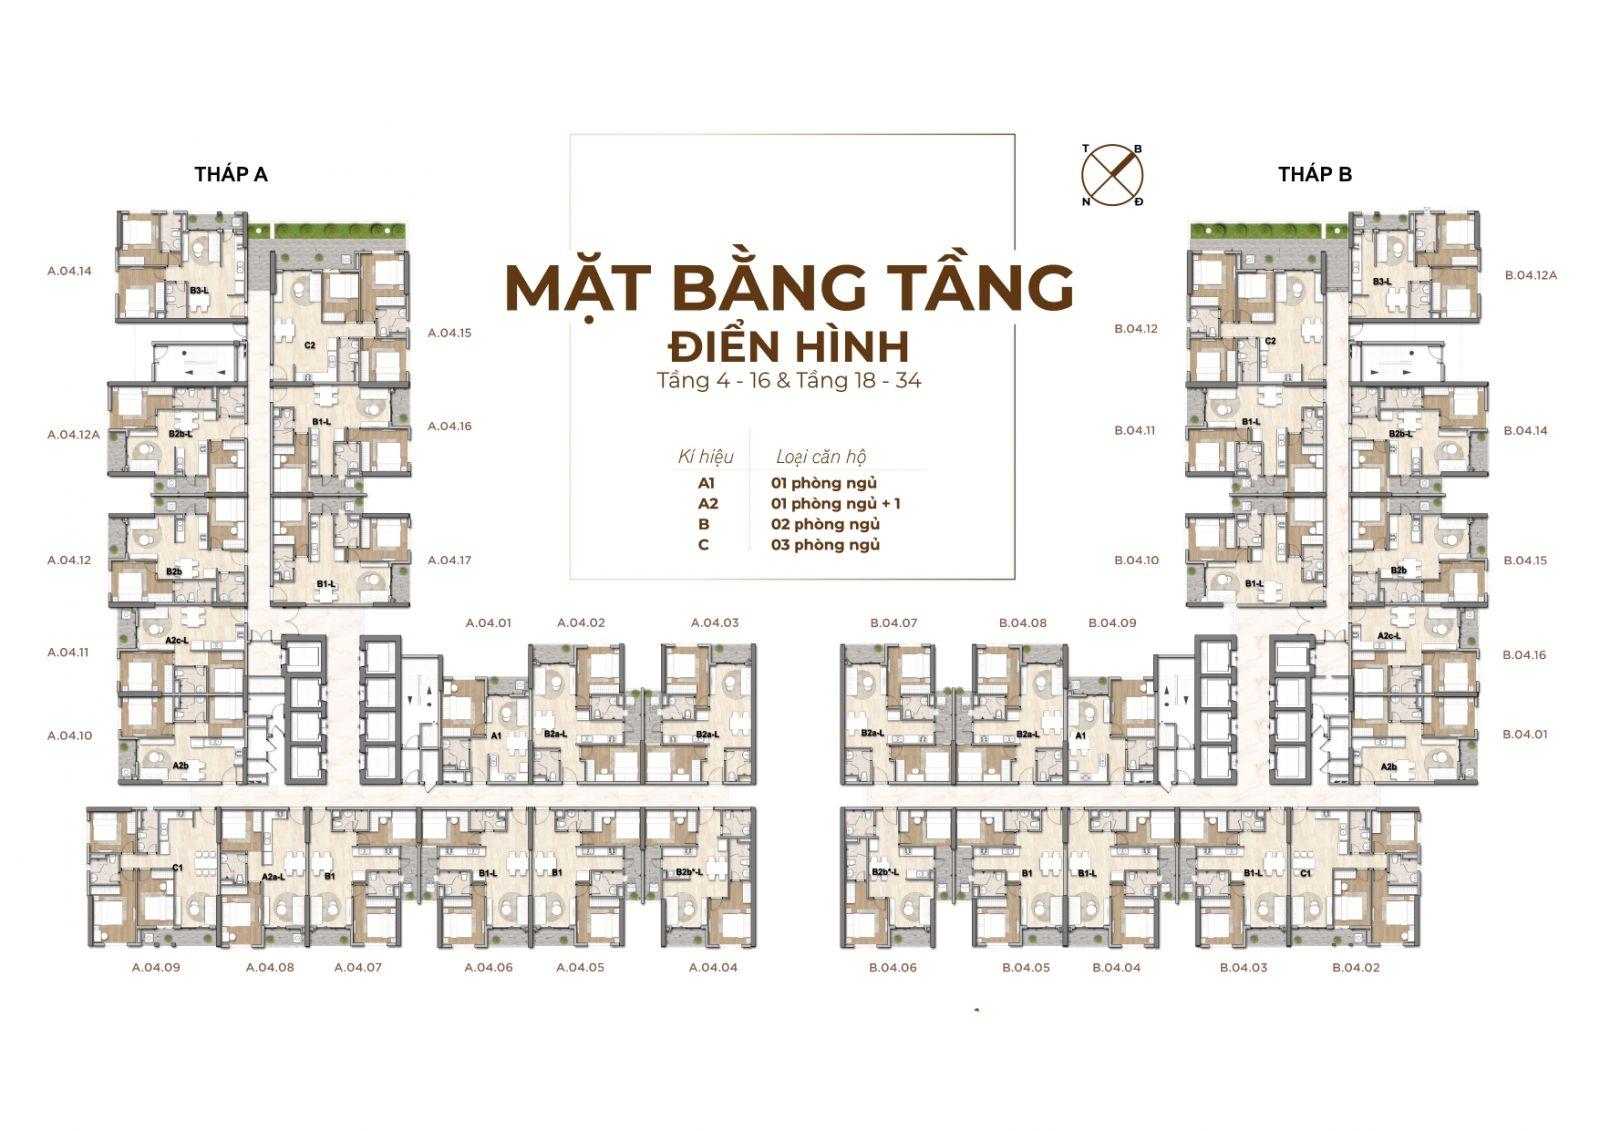 mat_bang_tang_4-16_va_18-34_ht_pearl